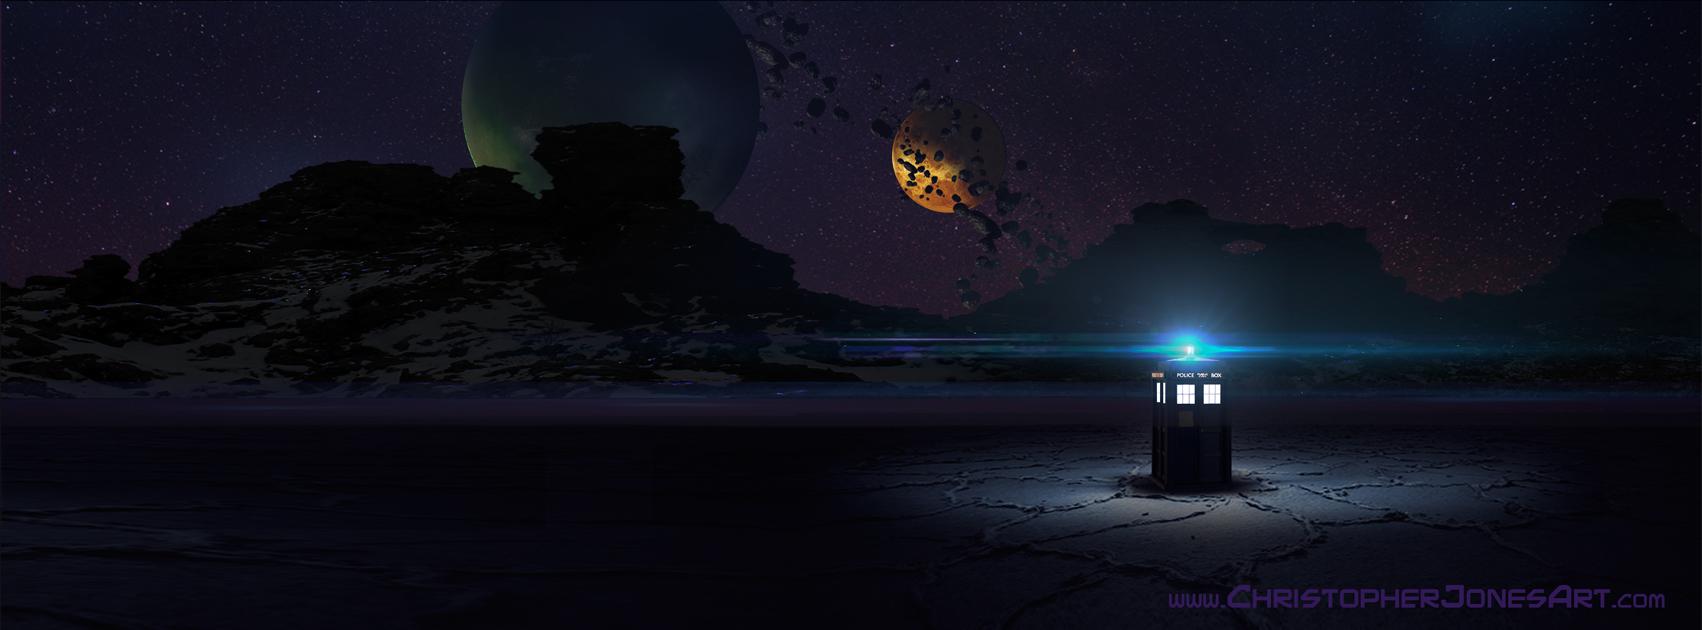 Good Wallpaper Halloween Facebook - TARDIS-on-Alien-World-facebook-timeline  Collection_738334.jpg